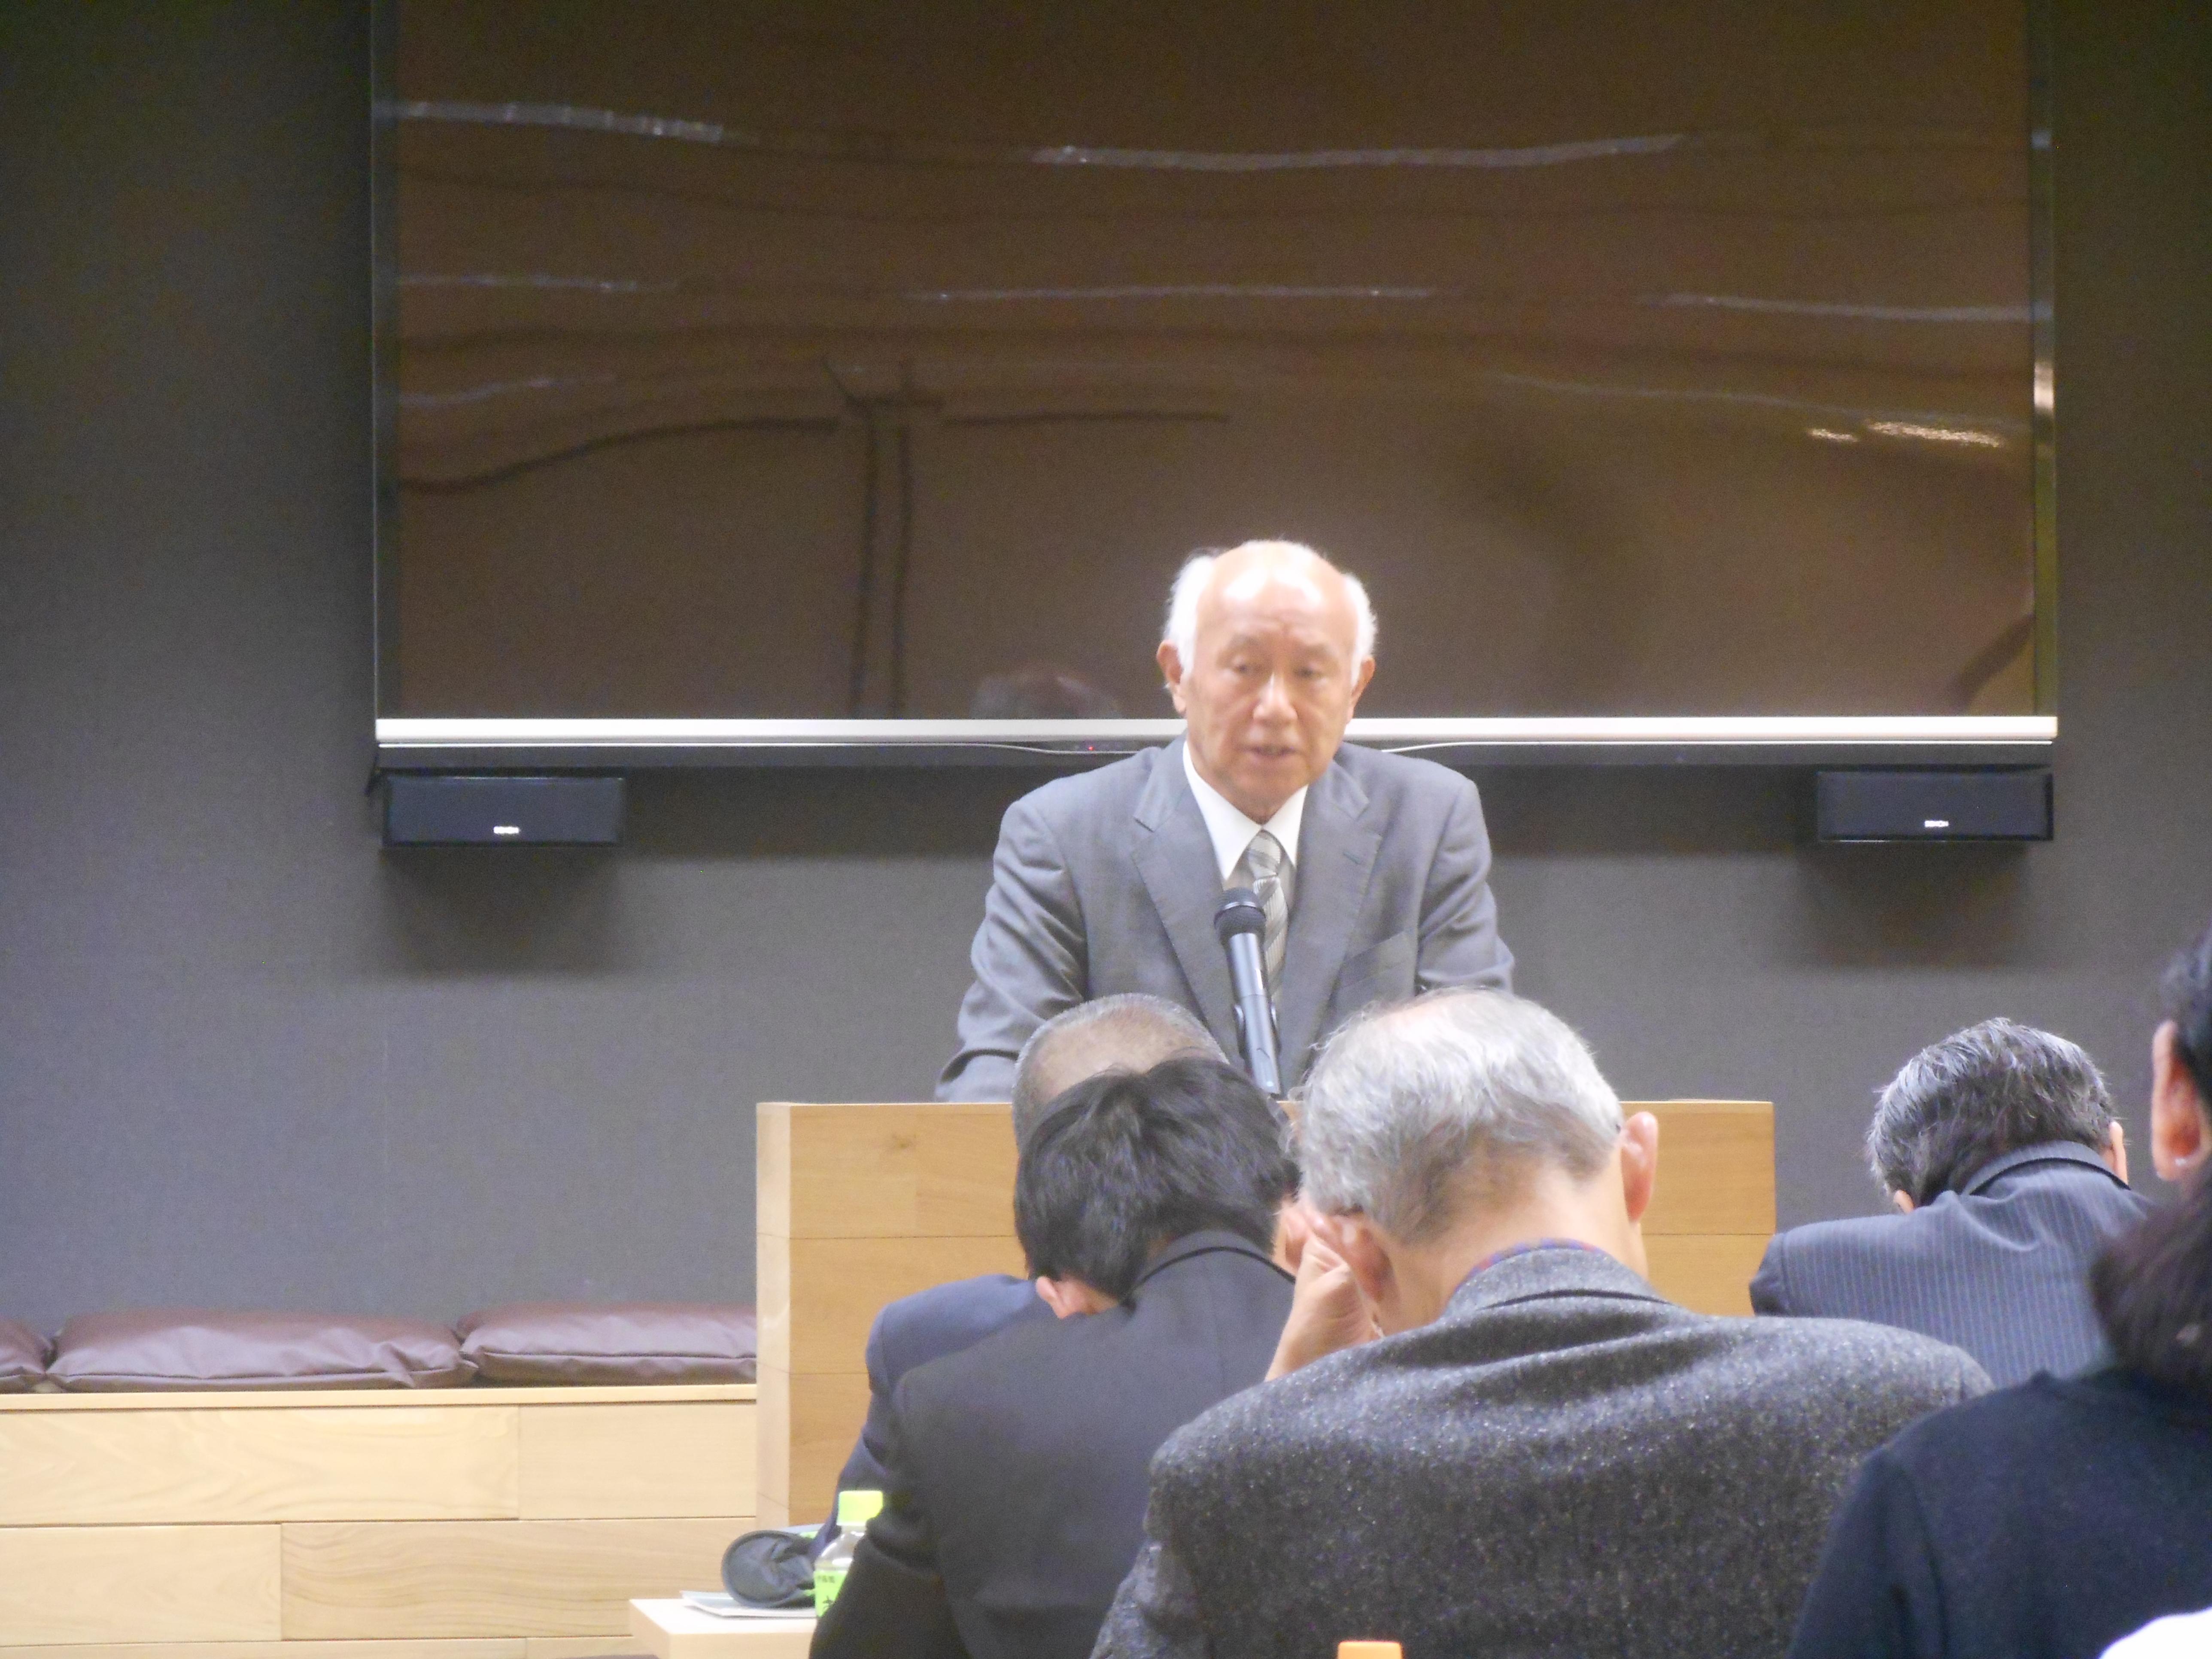 DSCN2300 - 4月1日東京思風塾の開催になります。